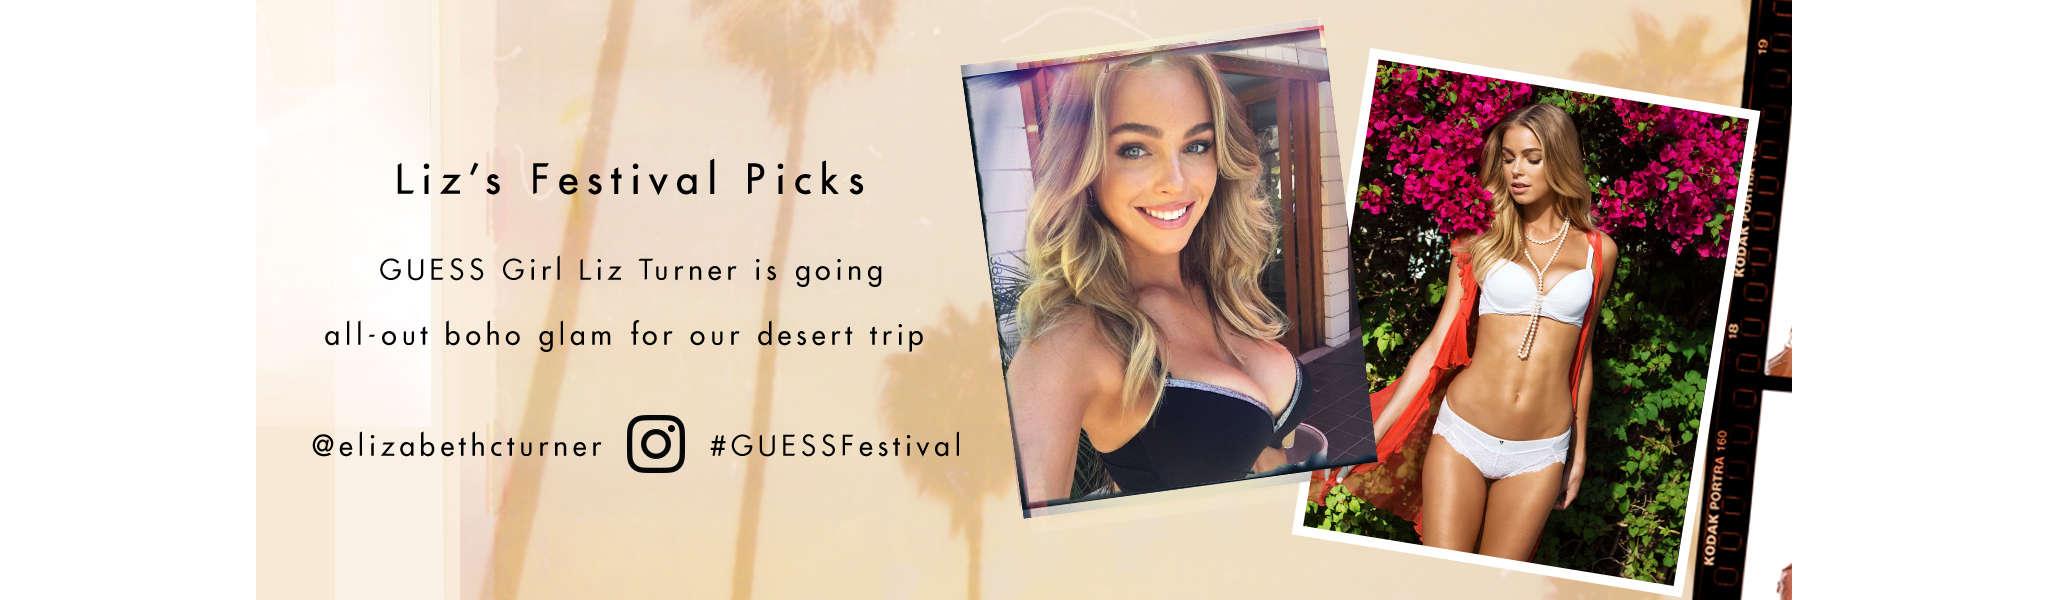 Liz's Festival Picks